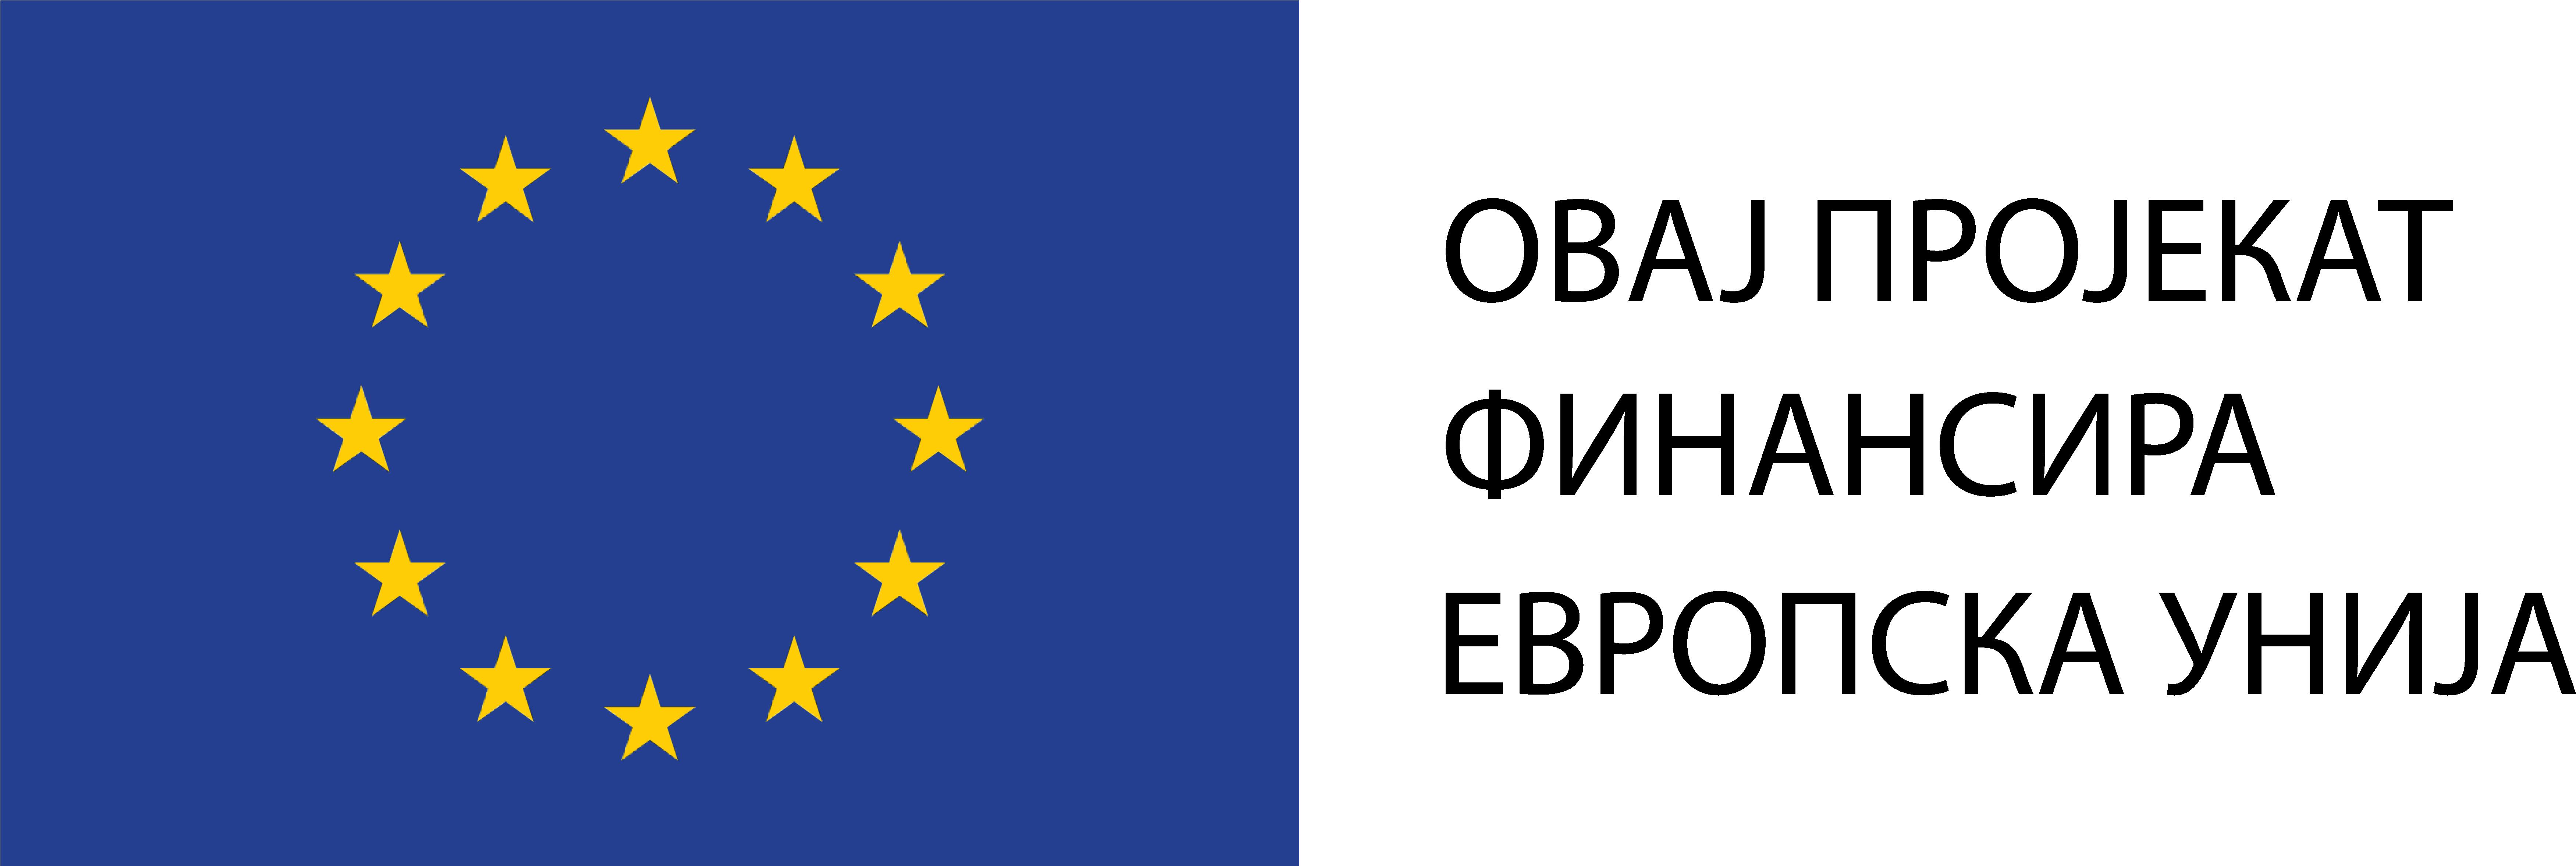 Projekat finansira Evropska Unija